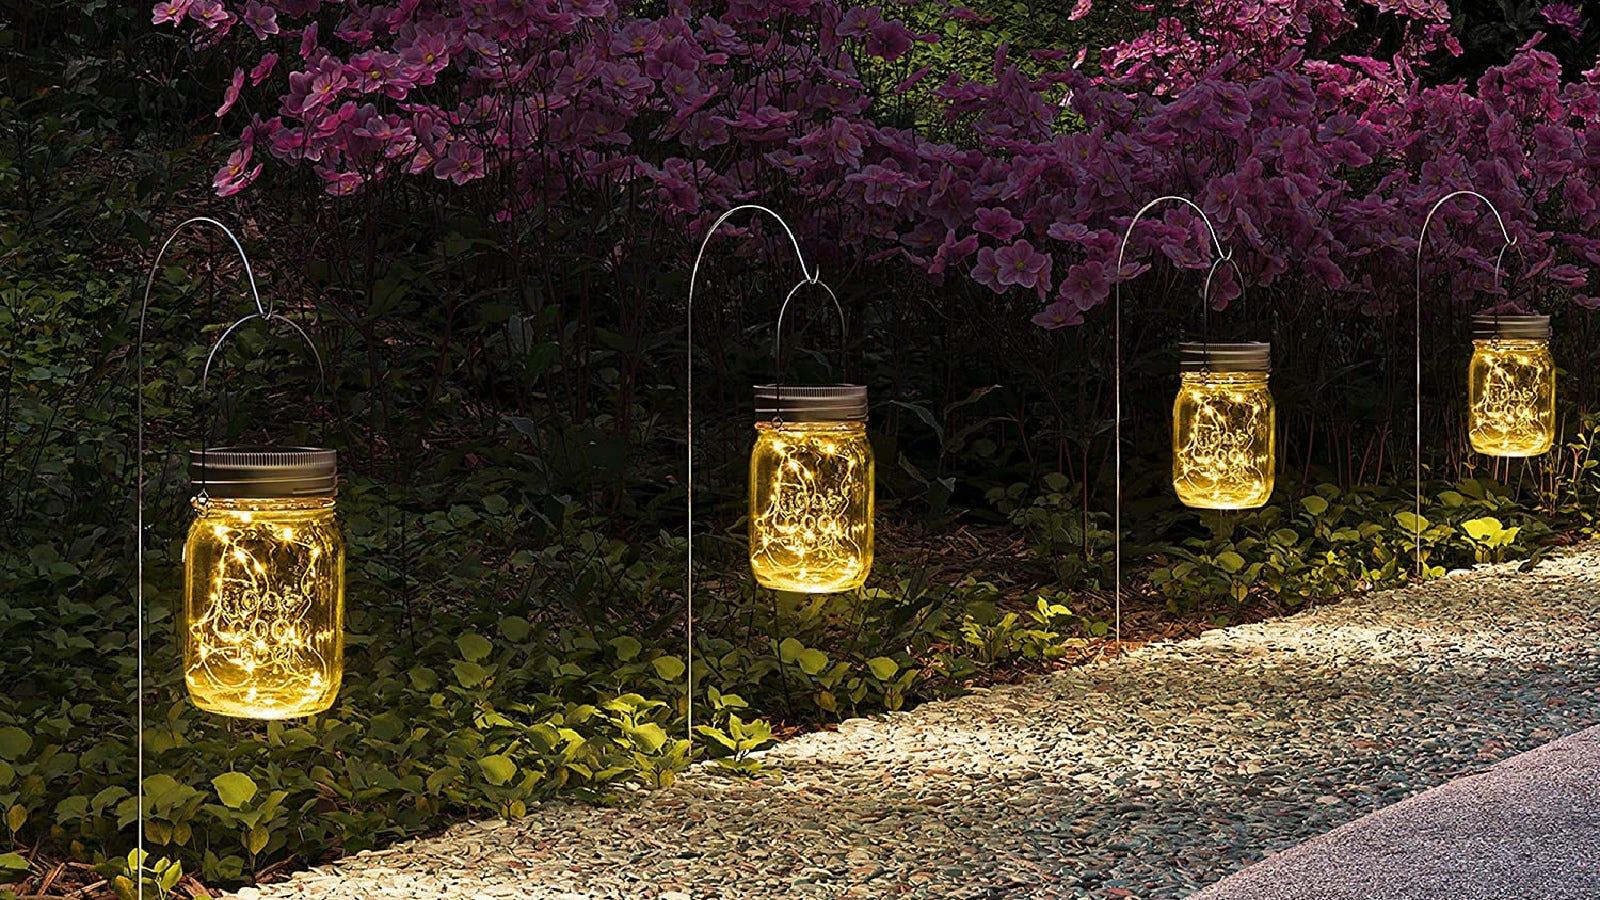 A path lining a bush garden, embellished with glowing Gigalumi jar lanterns at night.